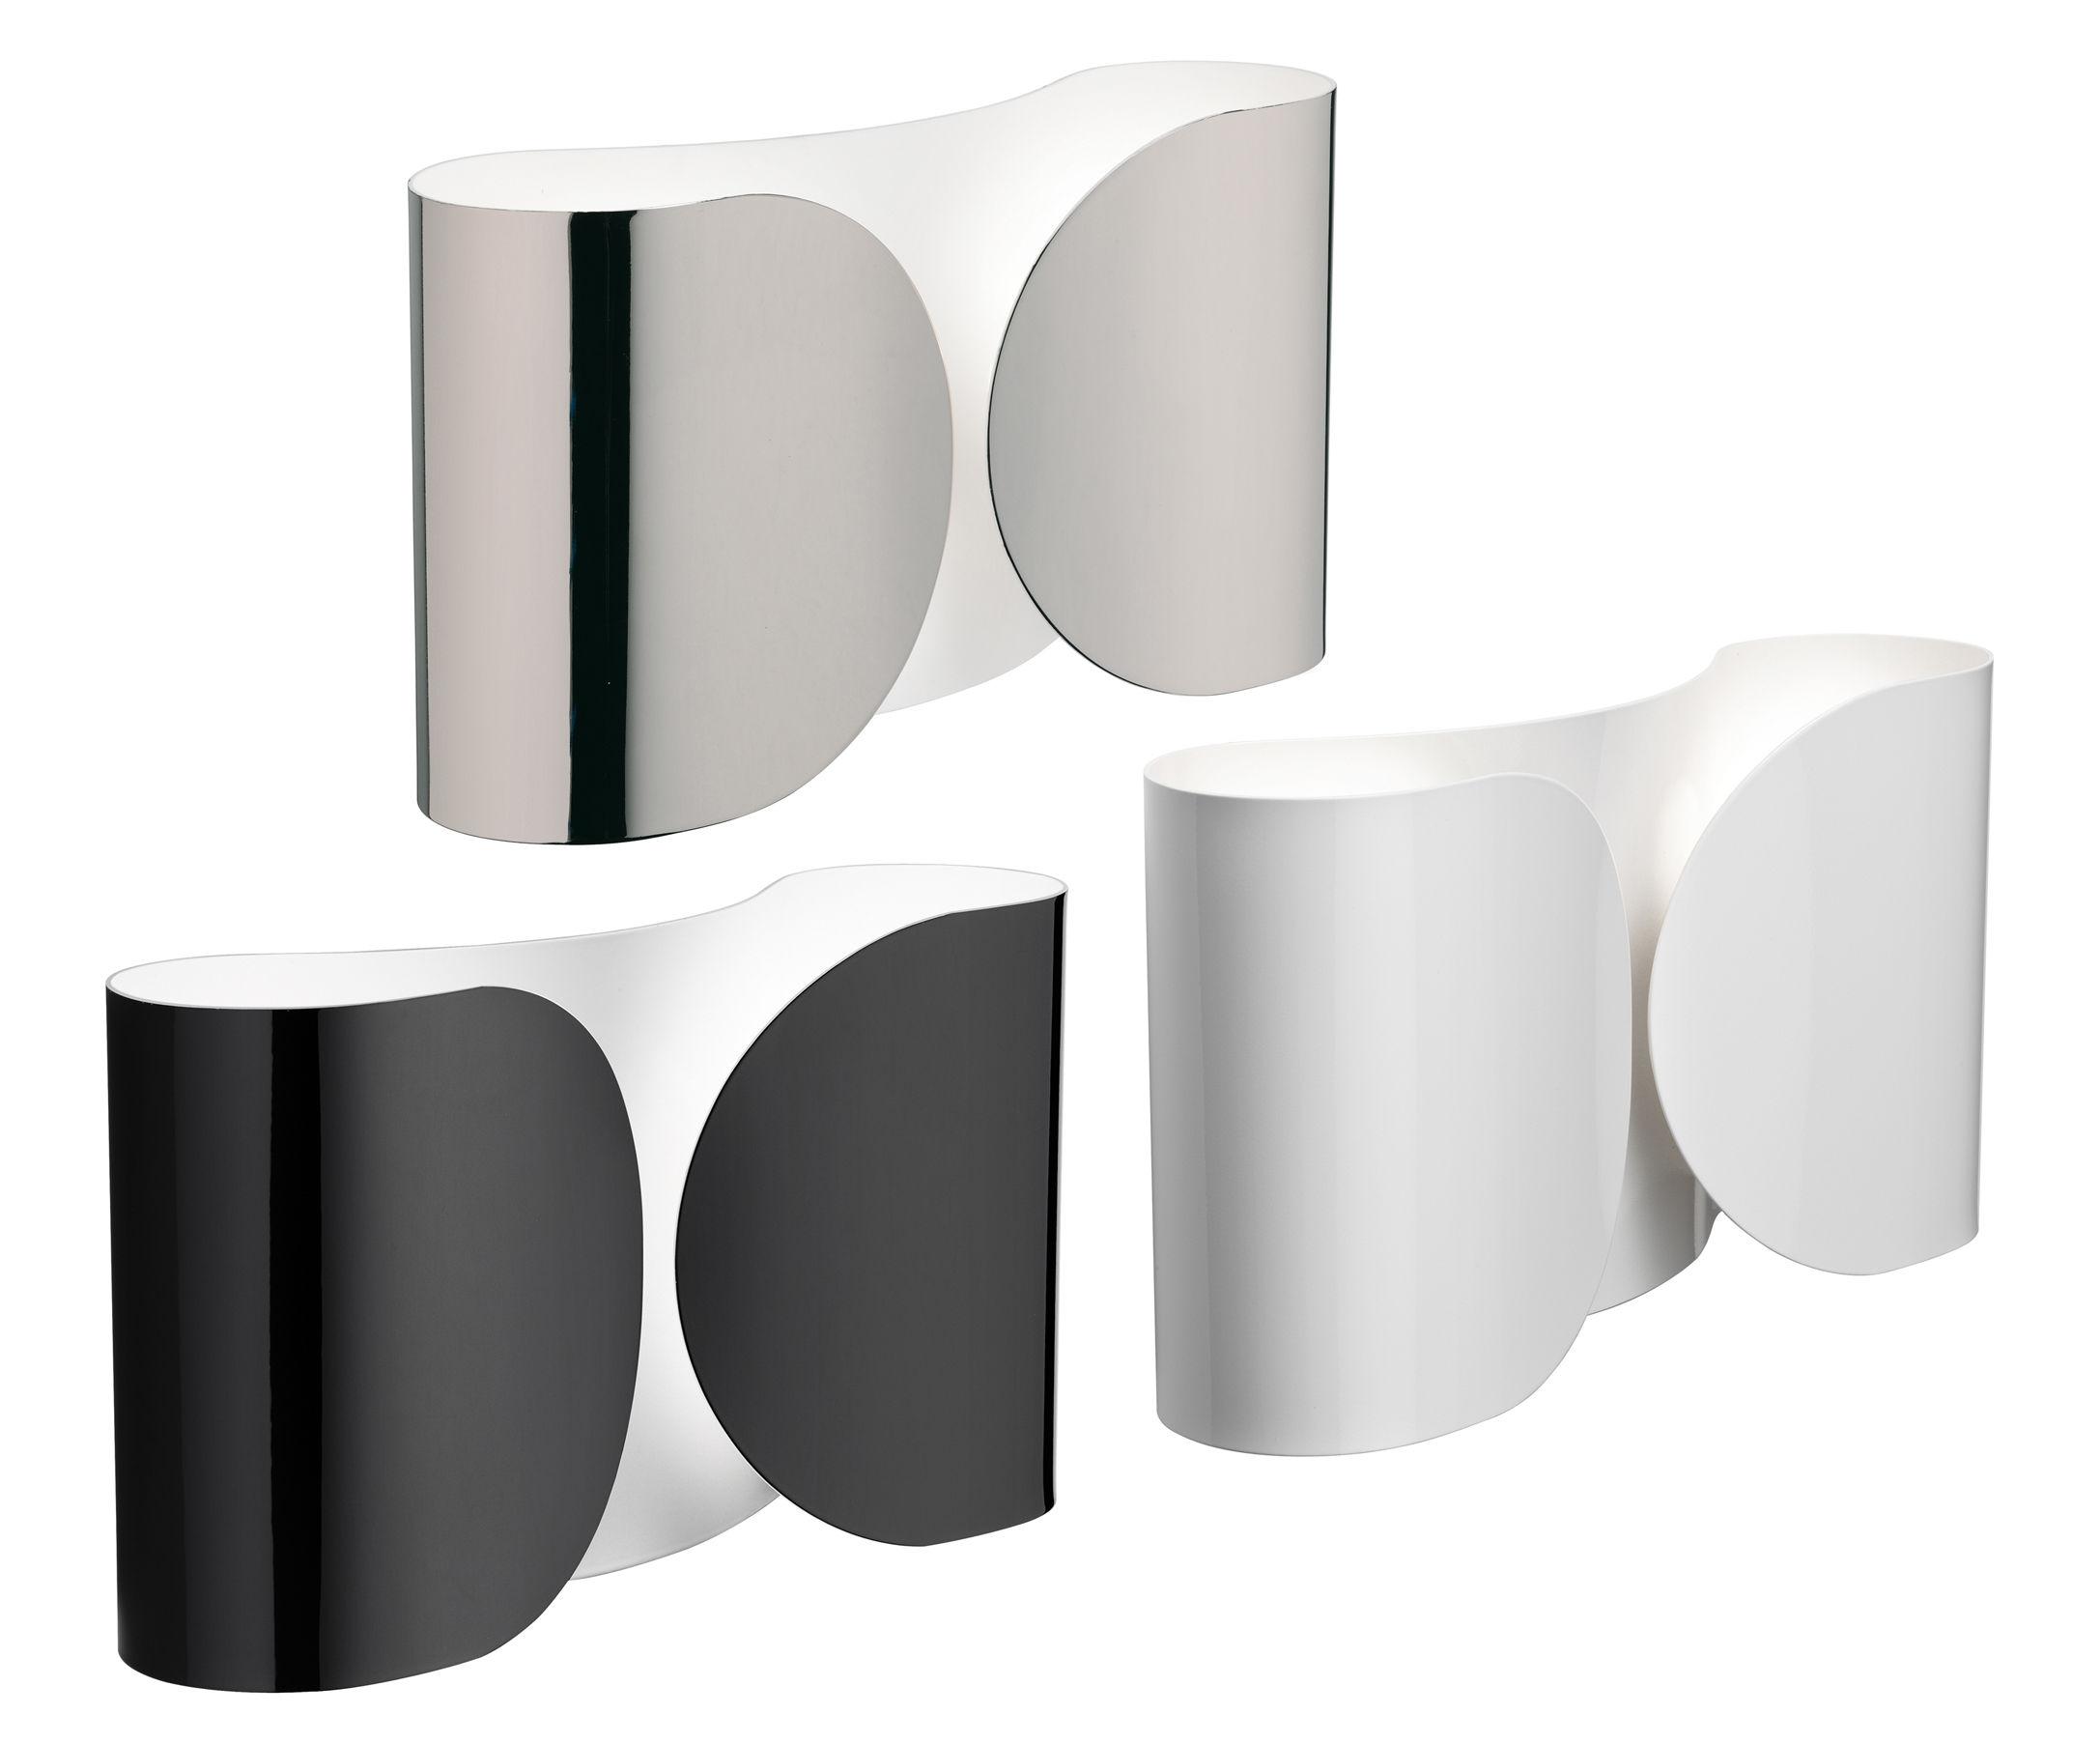 Foglio applique bianco by flos made in design for Flos illuminazione